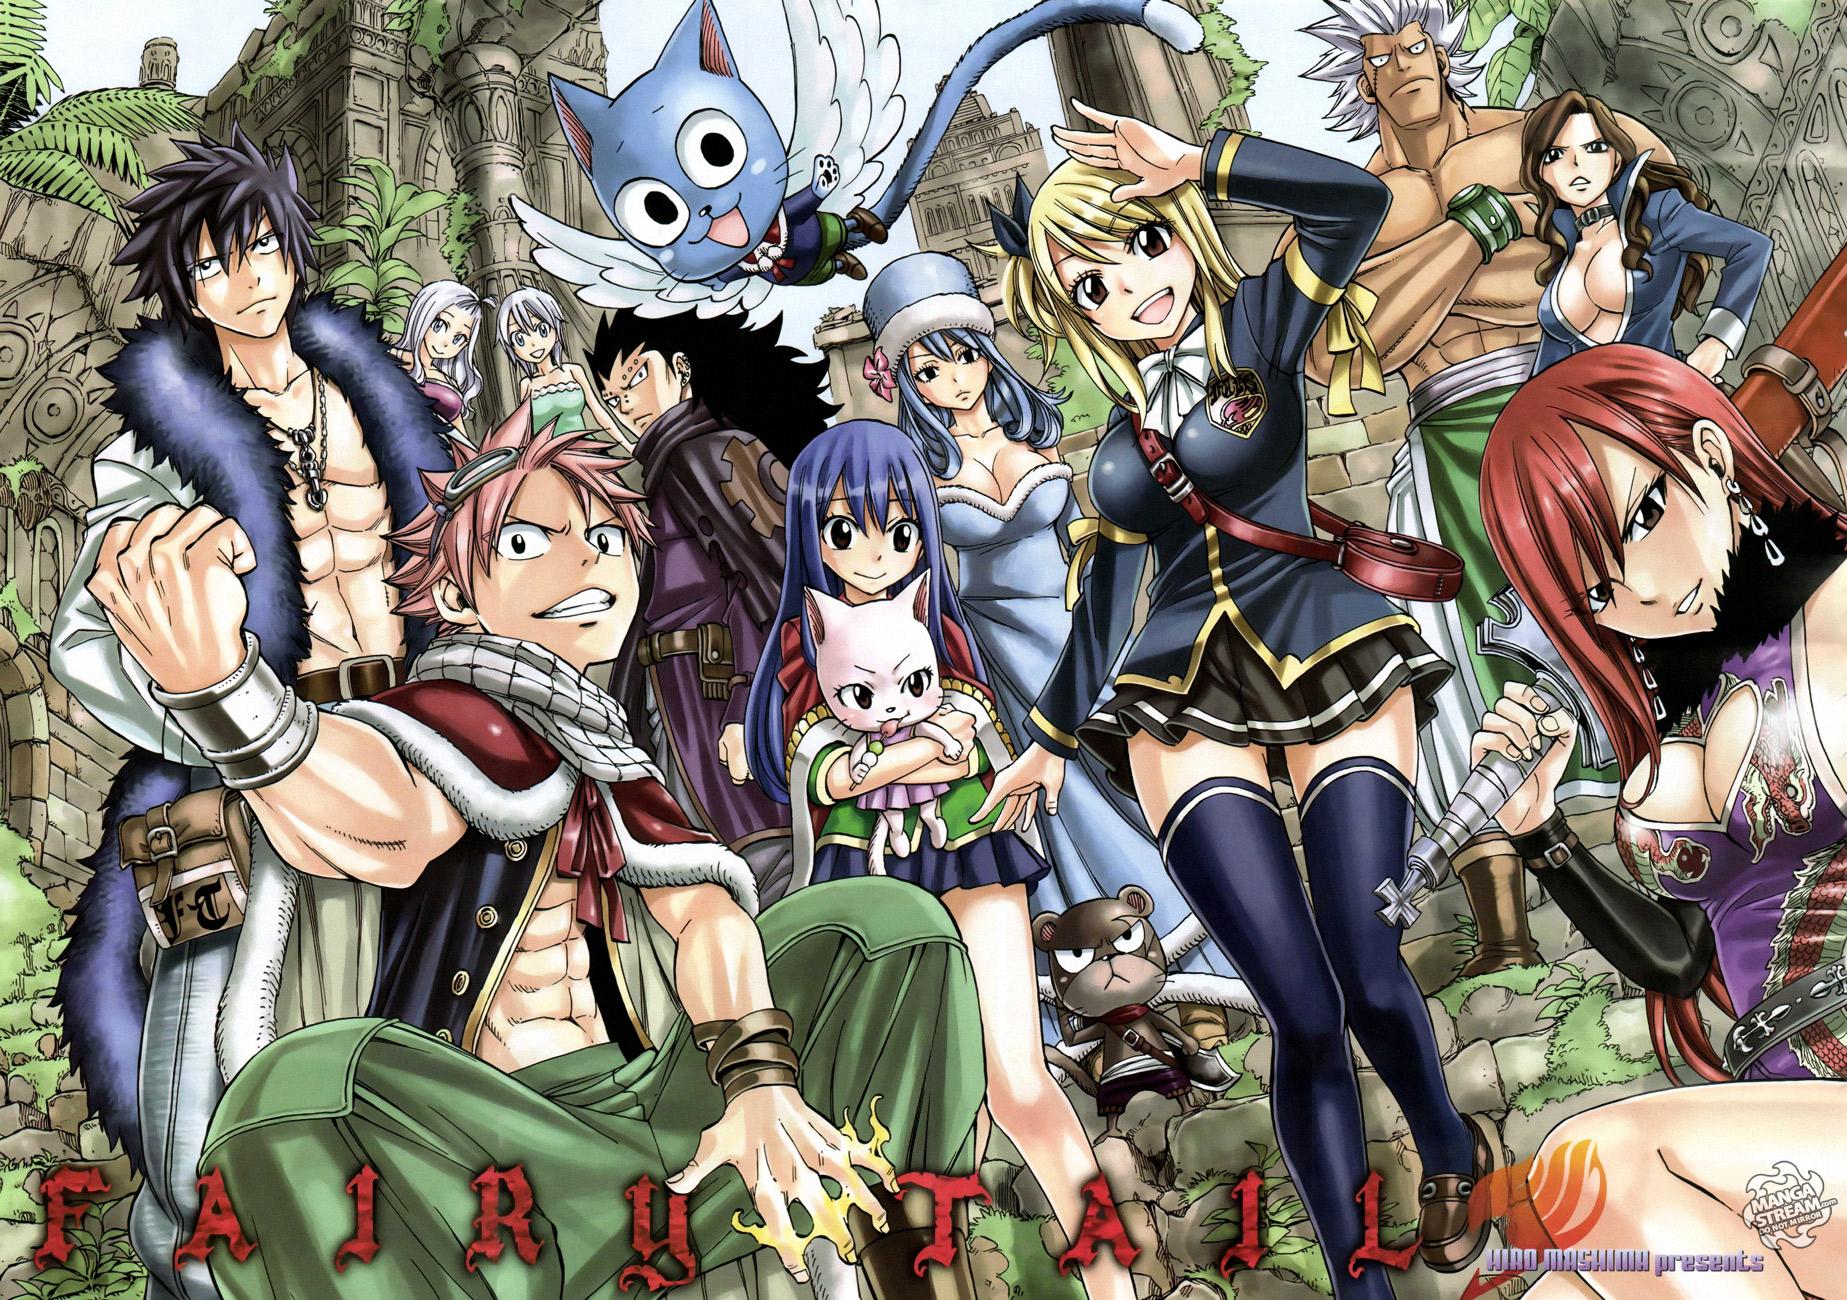 Fairy Tail Manga Chapter 263 by anime-manga-addict